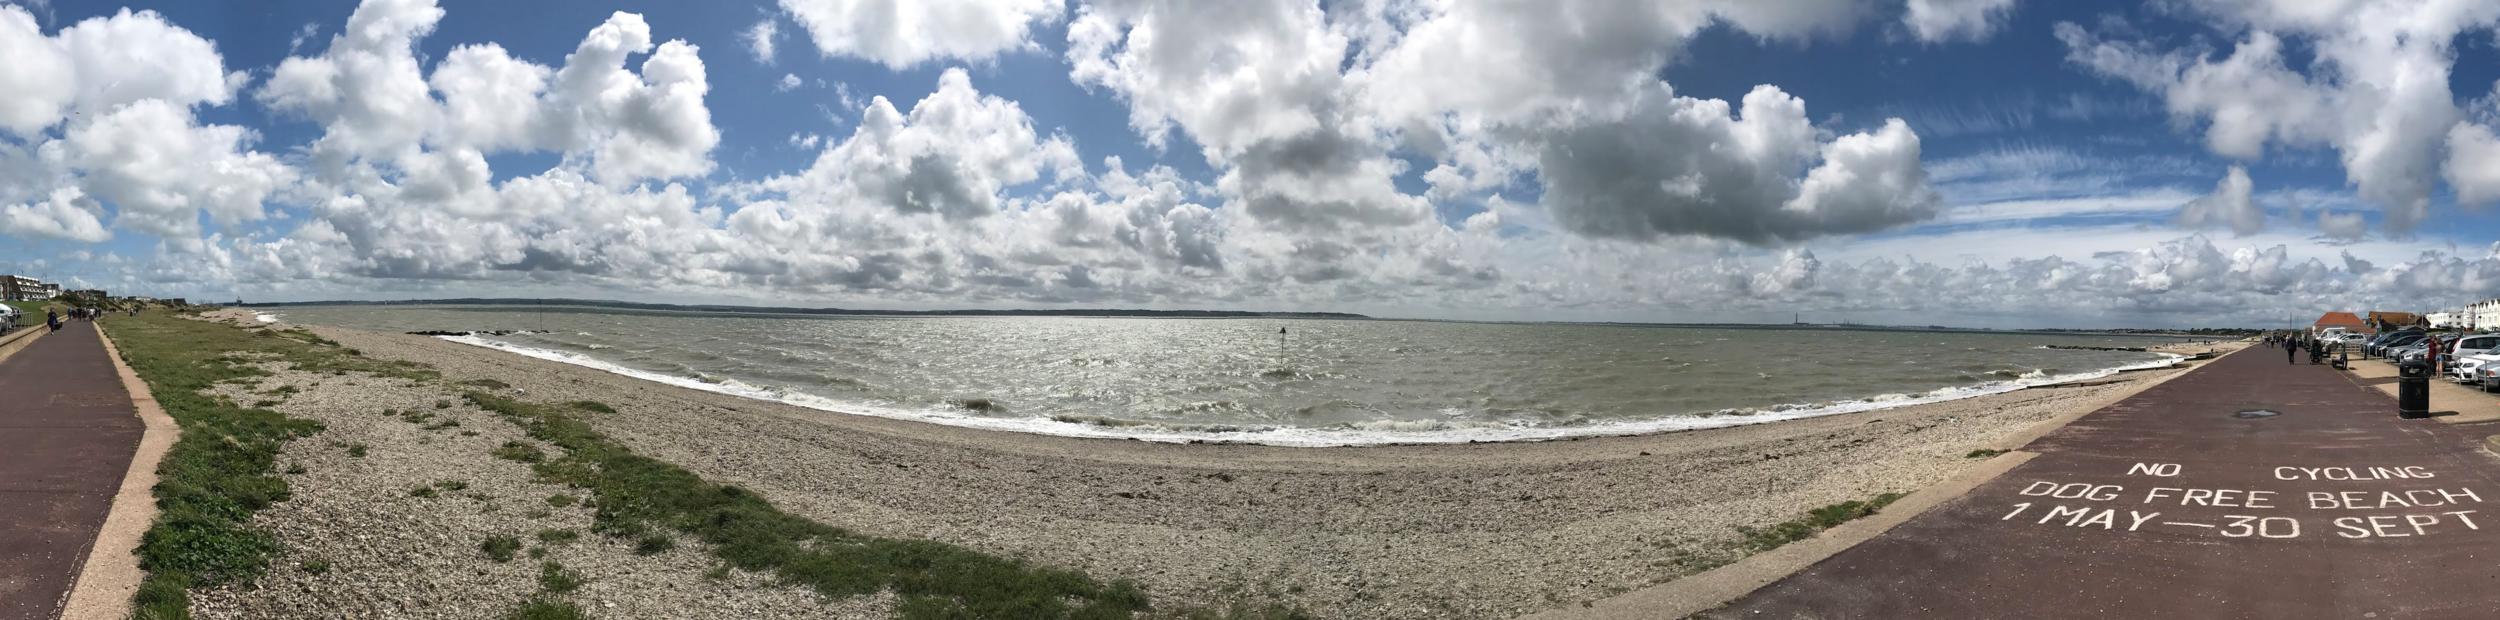 bending beach view.png